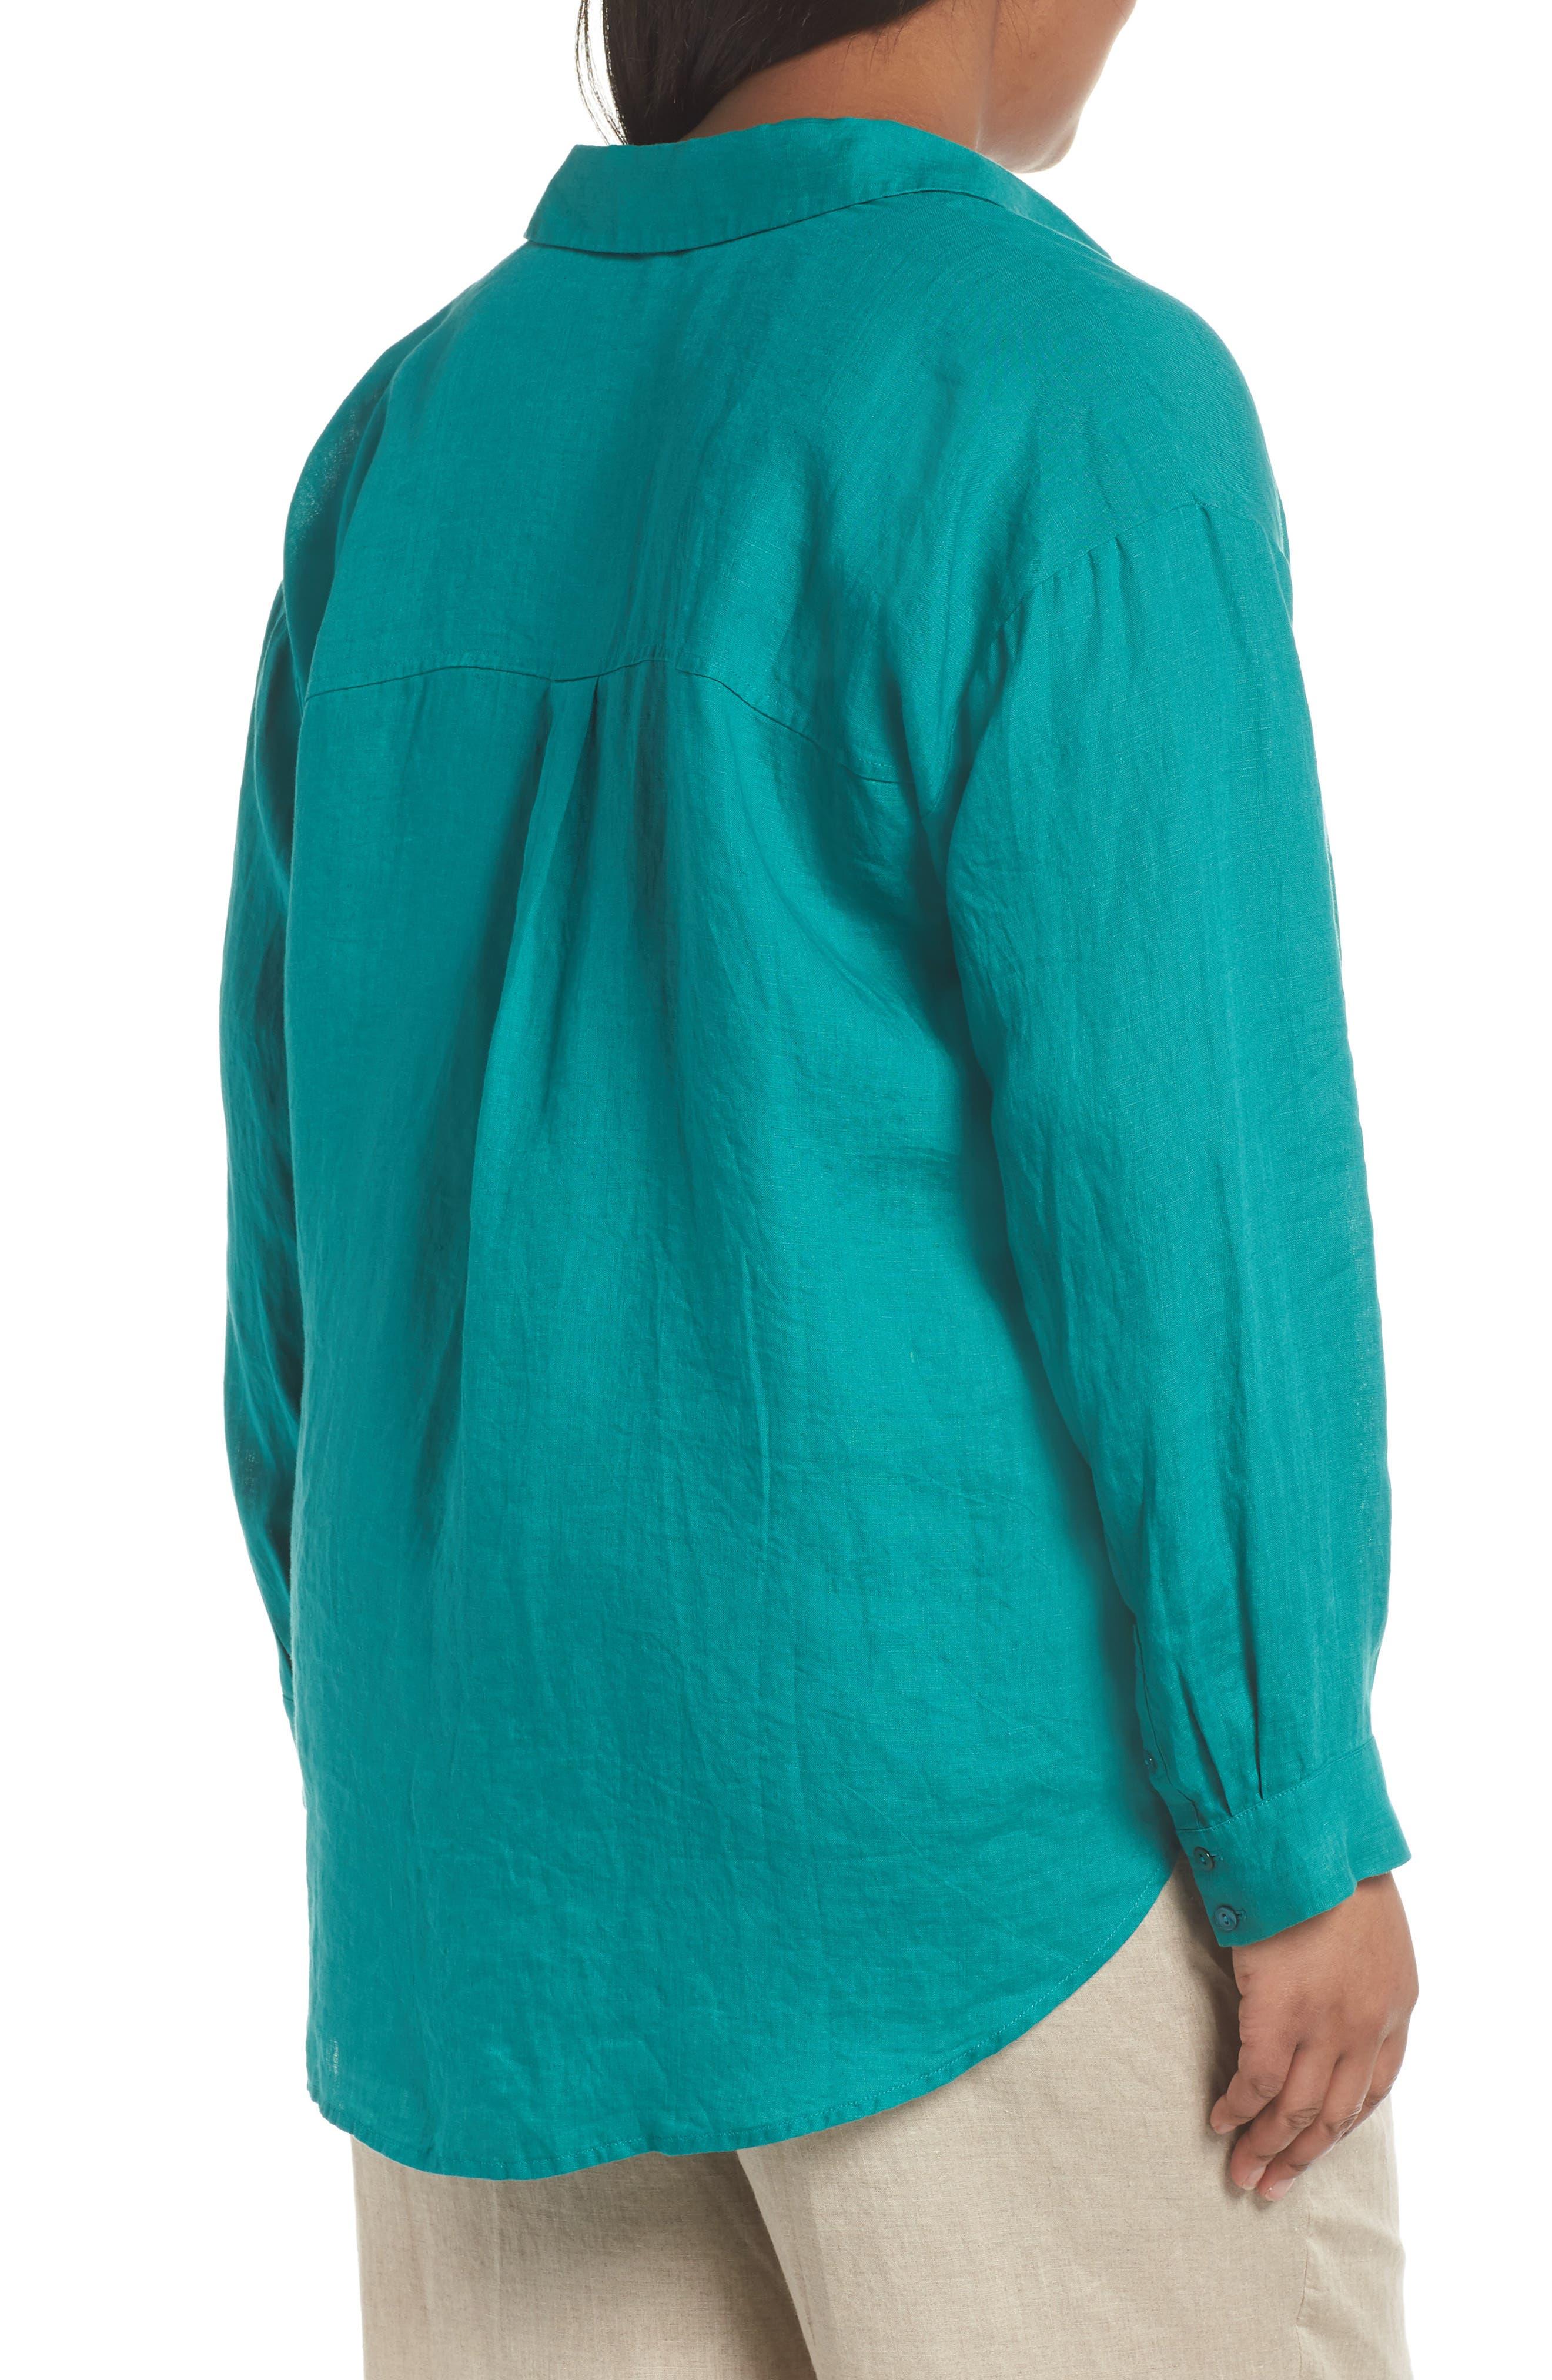 Organic Linen Shirt,                             Alternate thumbnail 2, color,                             Turquoise